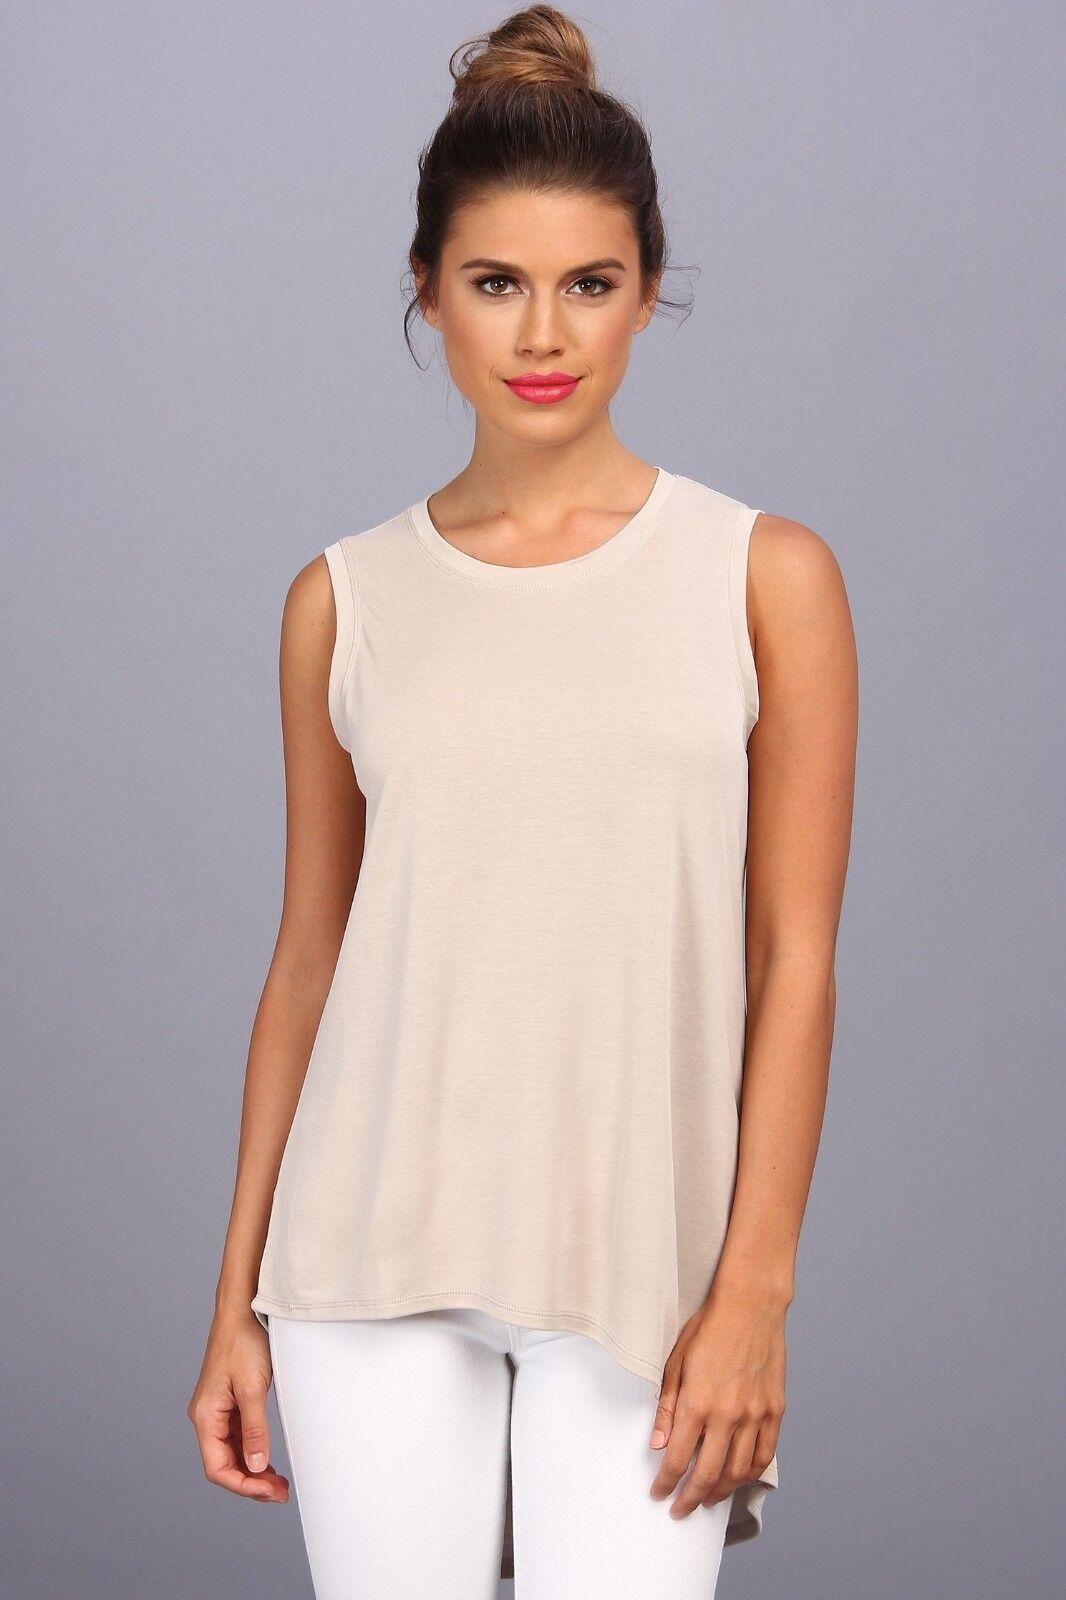 BCBG MAXAZRIA Woherren Karyn High Low Vintage L Stone t-shirt blouse Top NEW